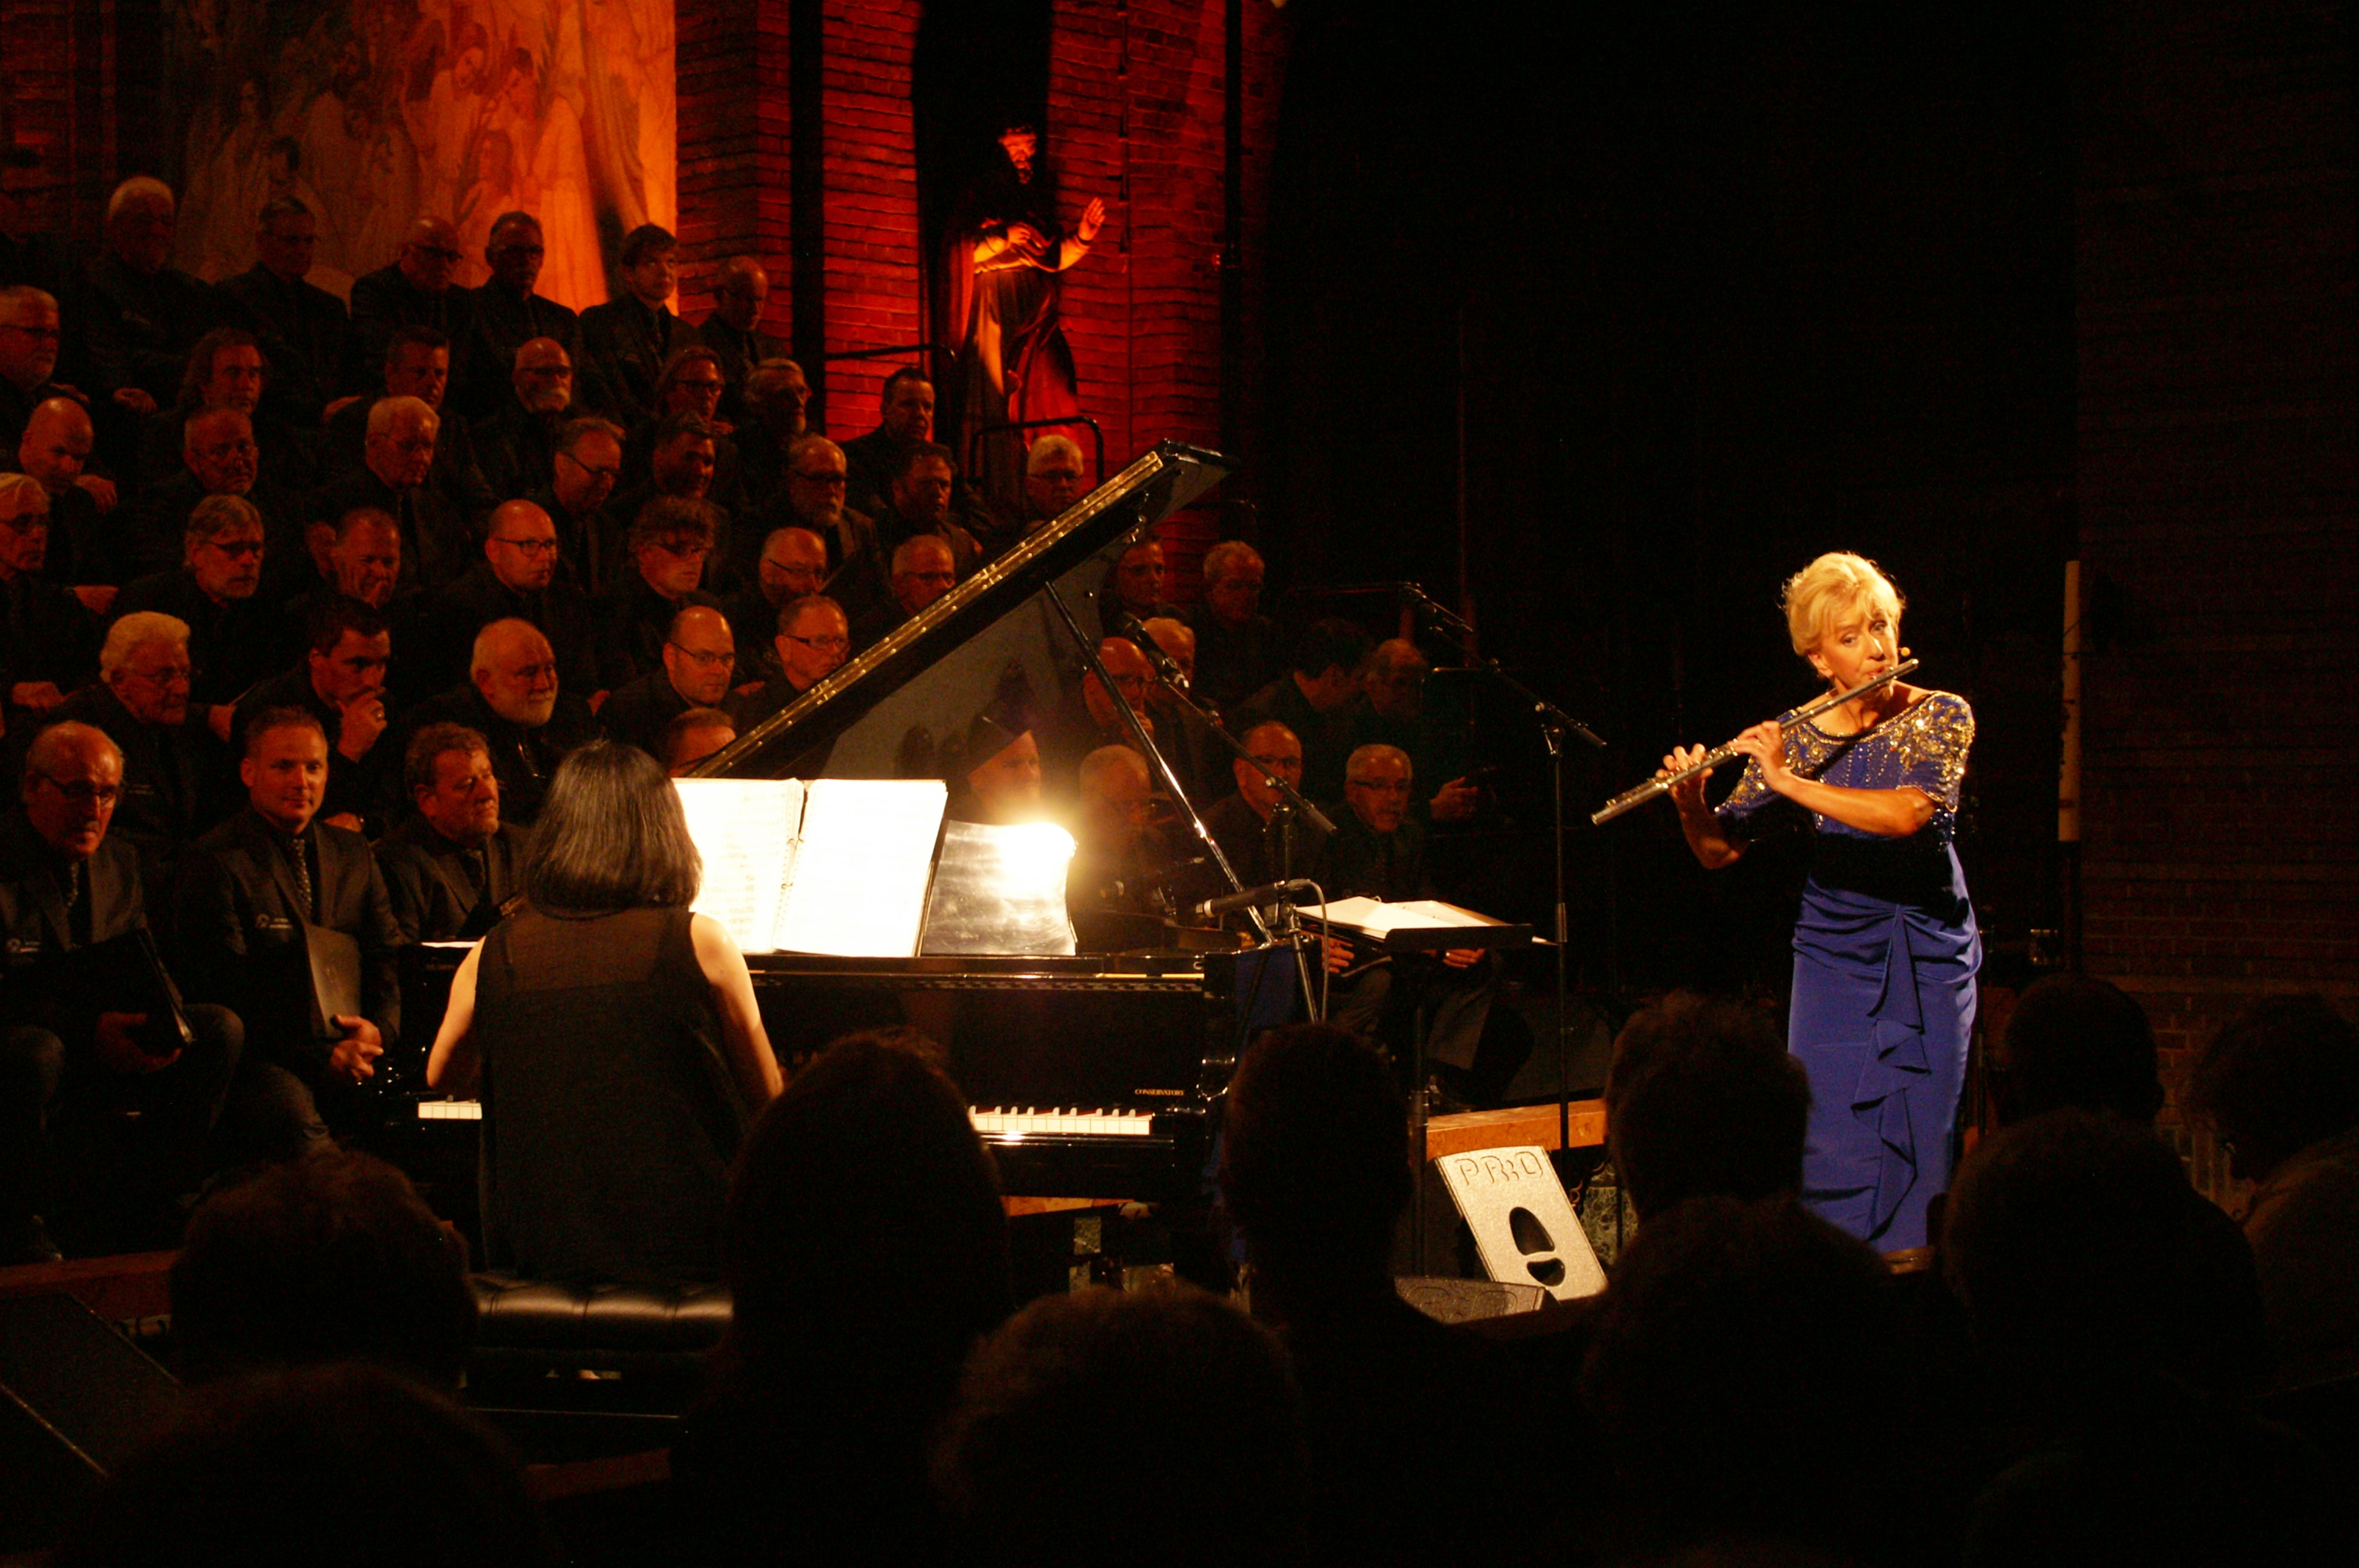 EMK-2015-06-13-Concert-EMK-en-Berdien-Stenberg-1